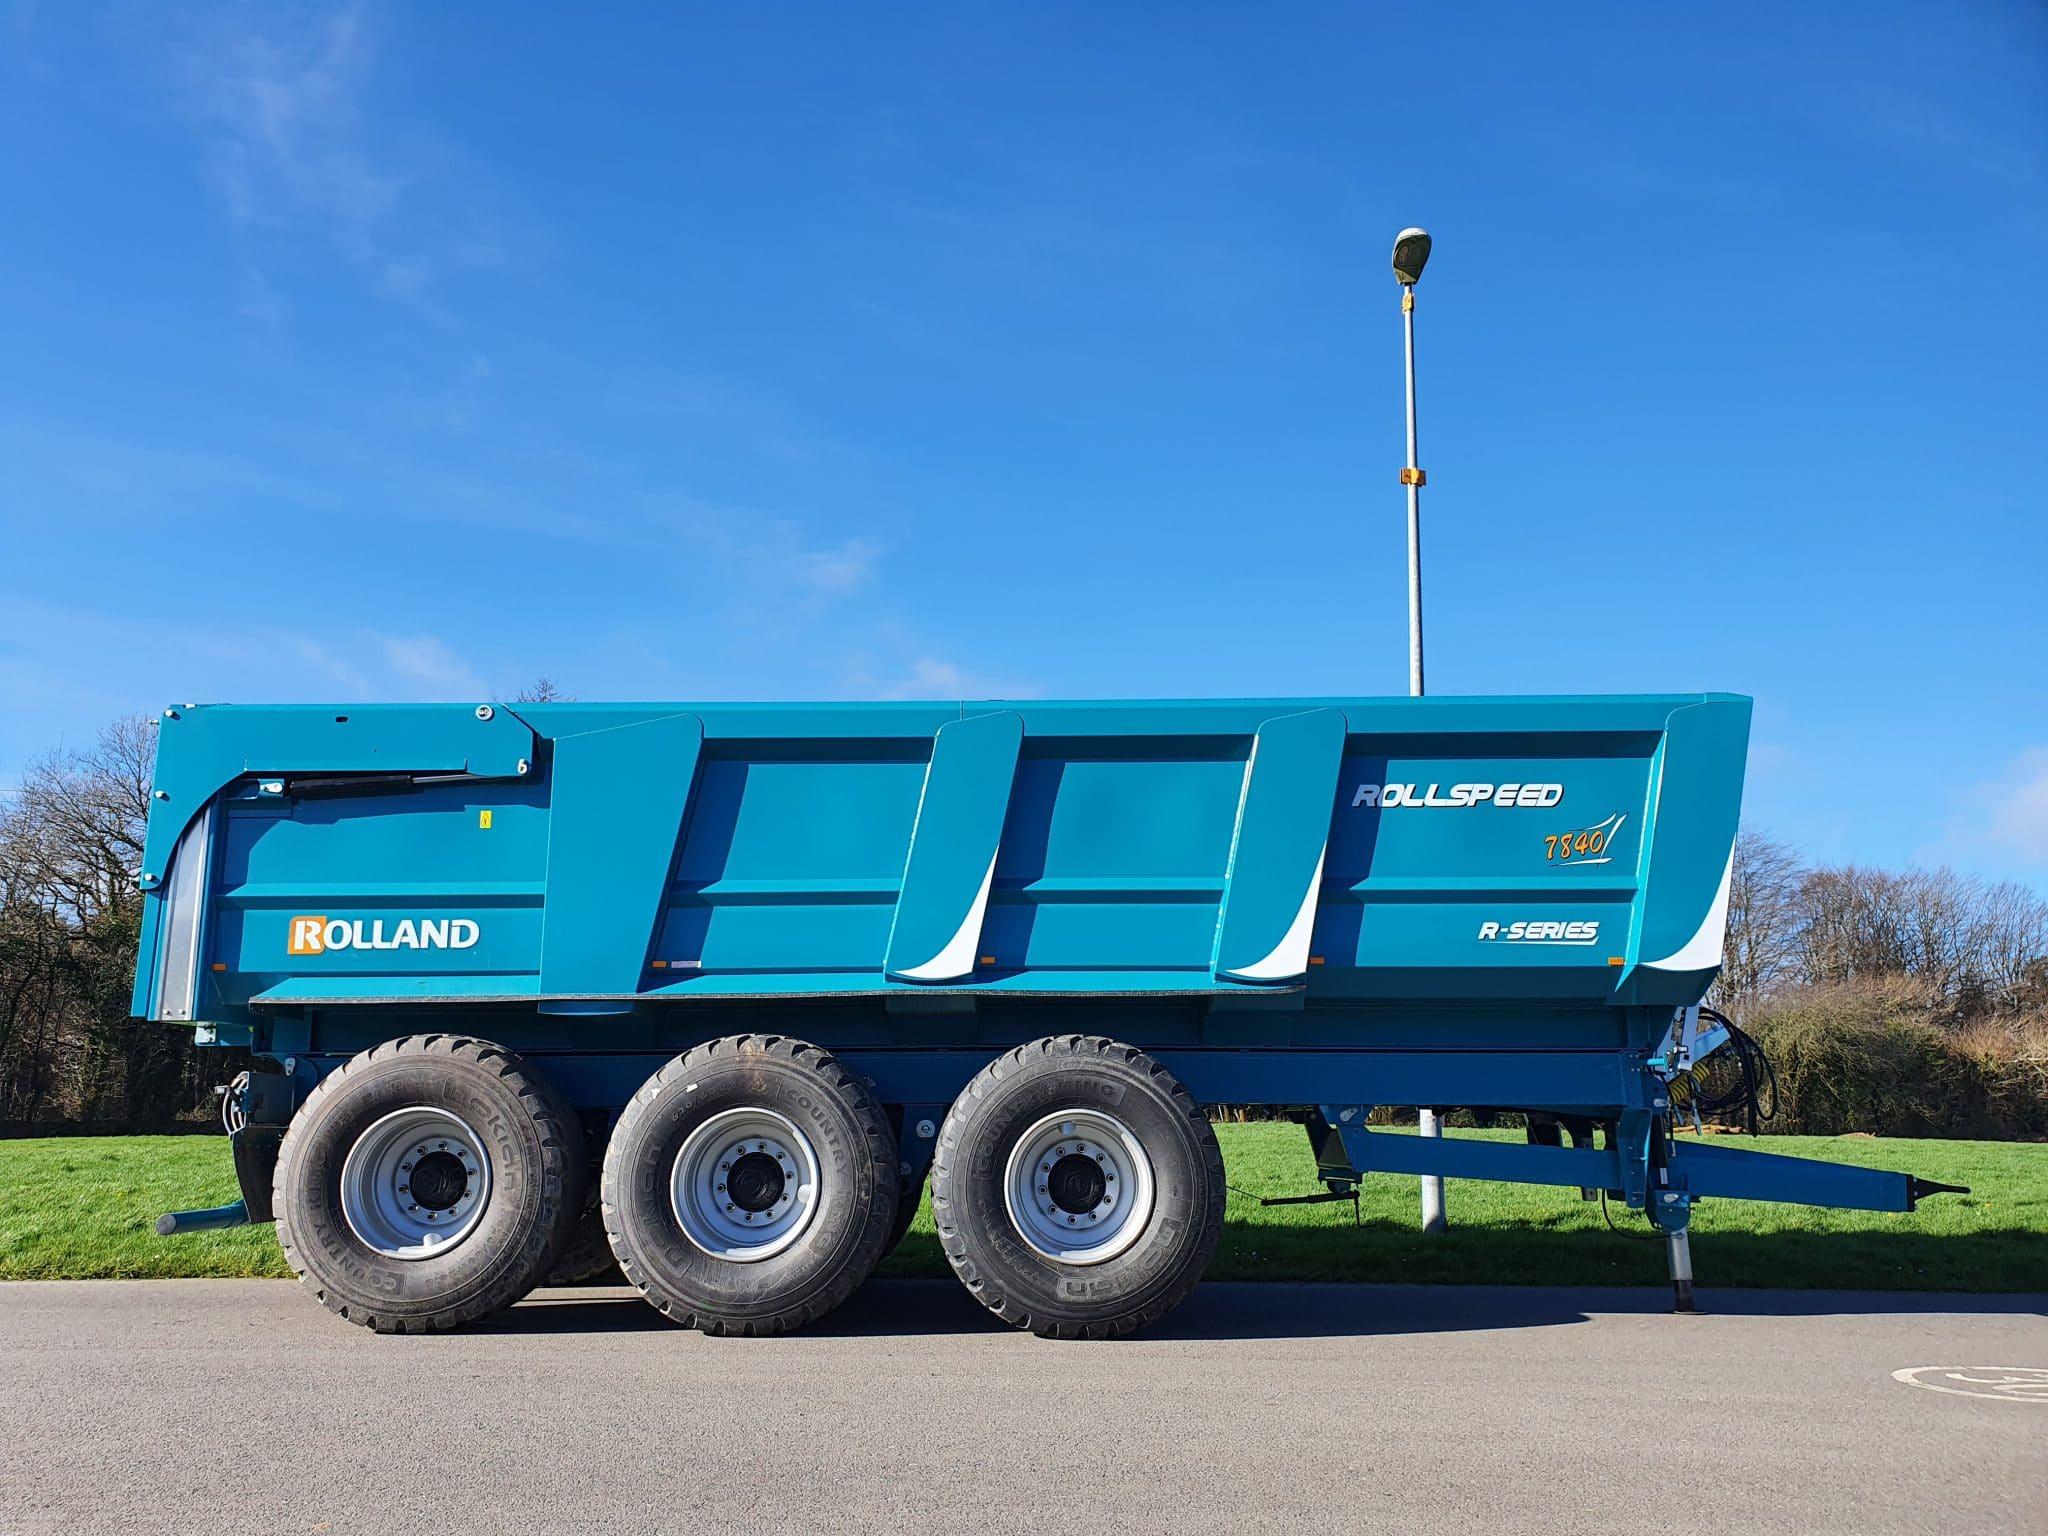 Rollspeed R-Series 7840